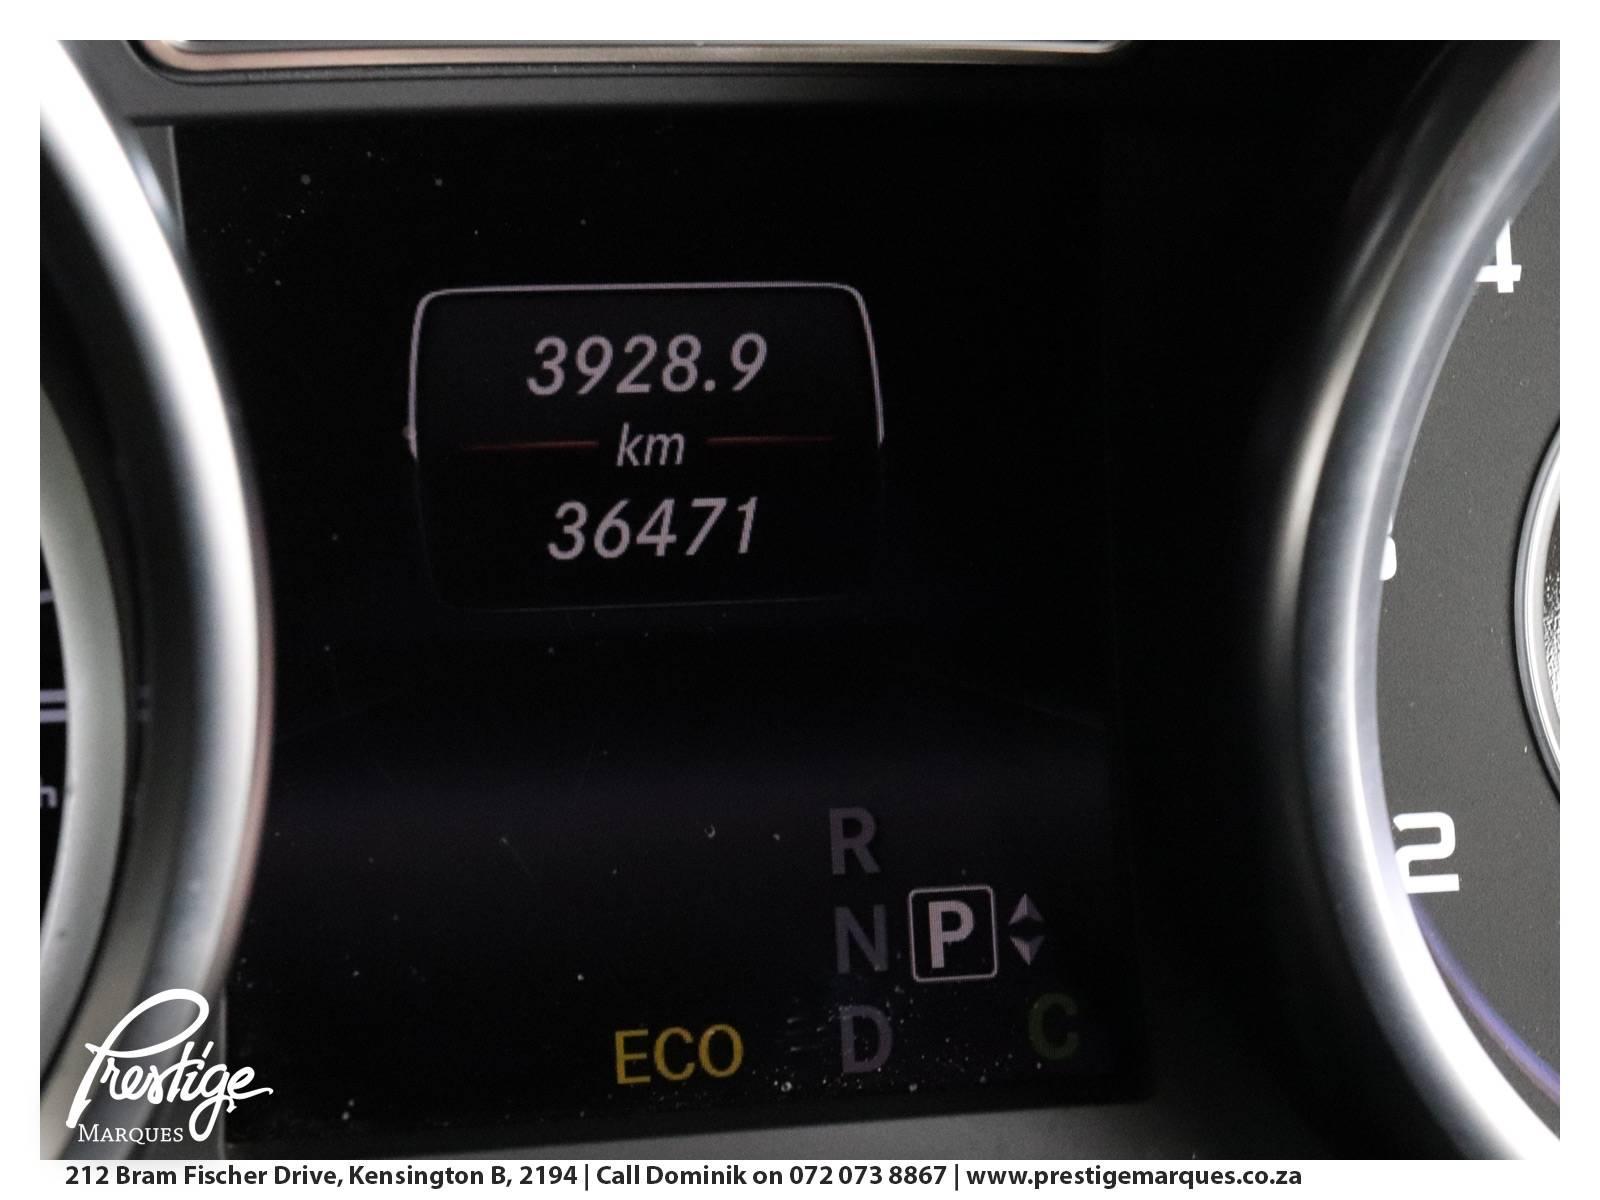 2015-Mercedes-Benz-ML63-AMG-Prestige-Marques-Randburg-Sandton-14